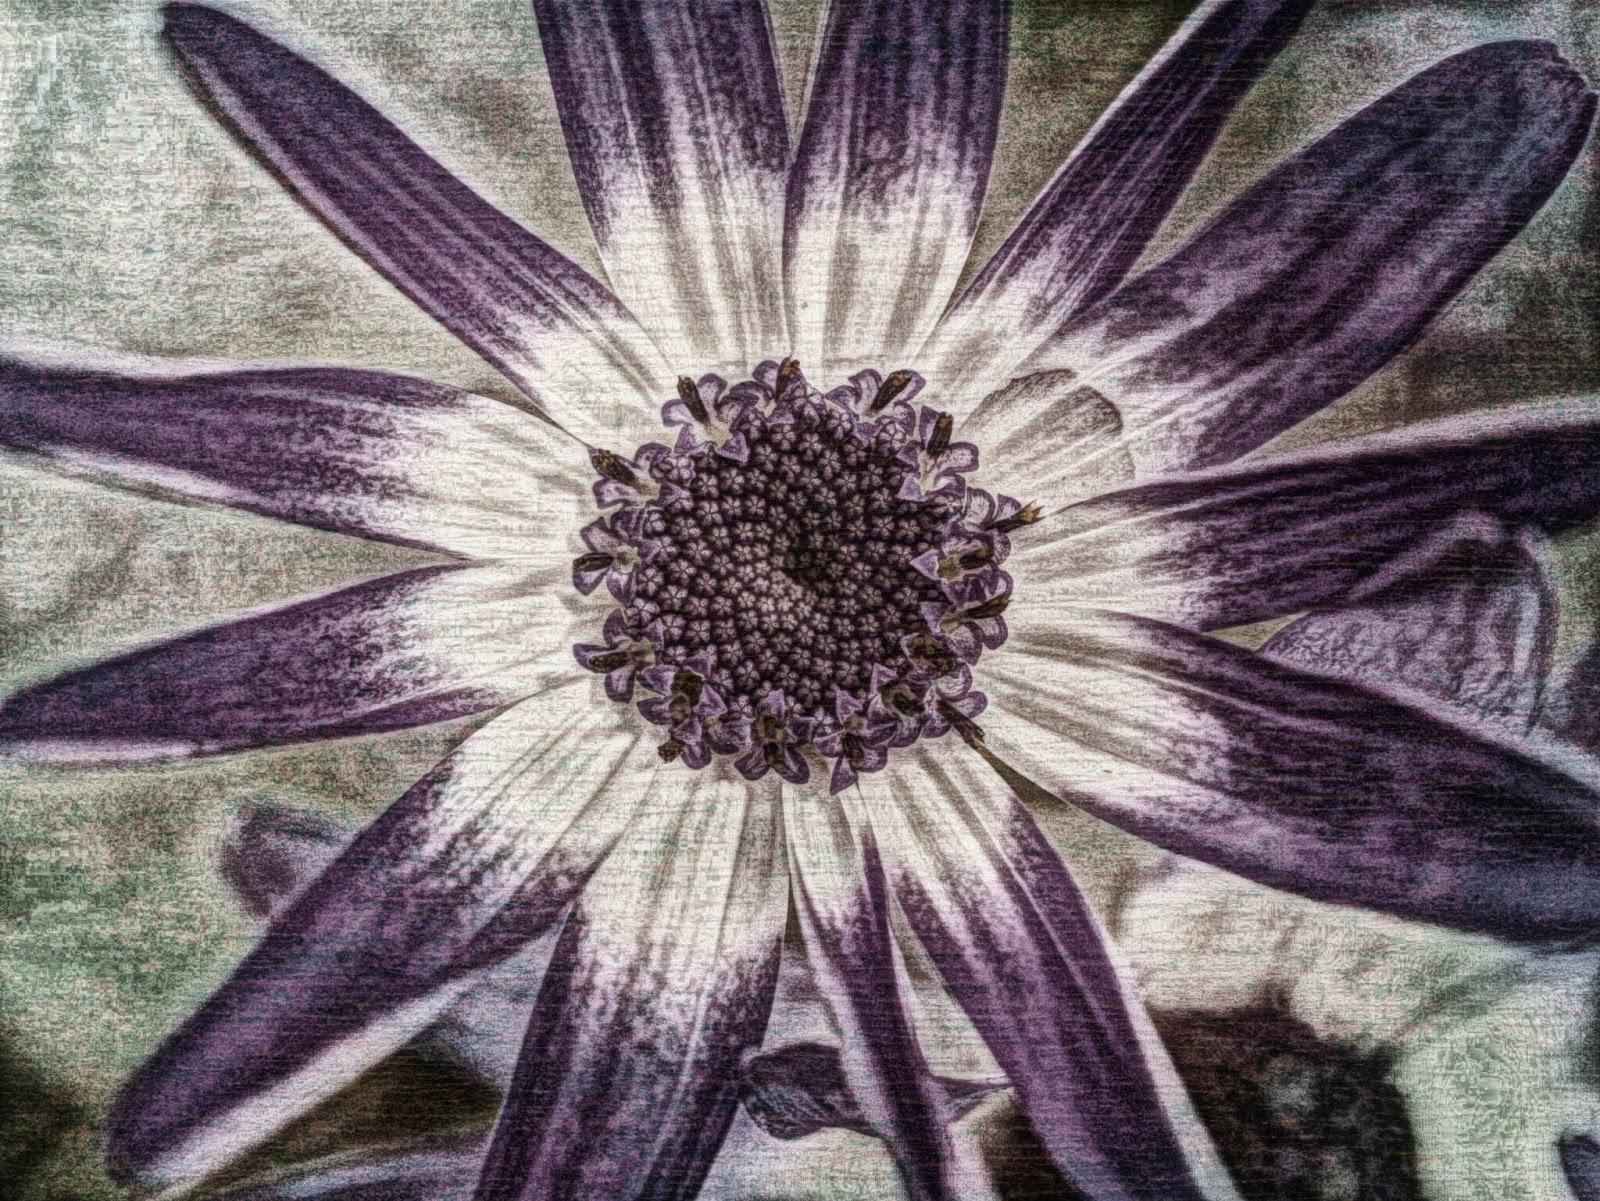 flower photo edited using Grunge